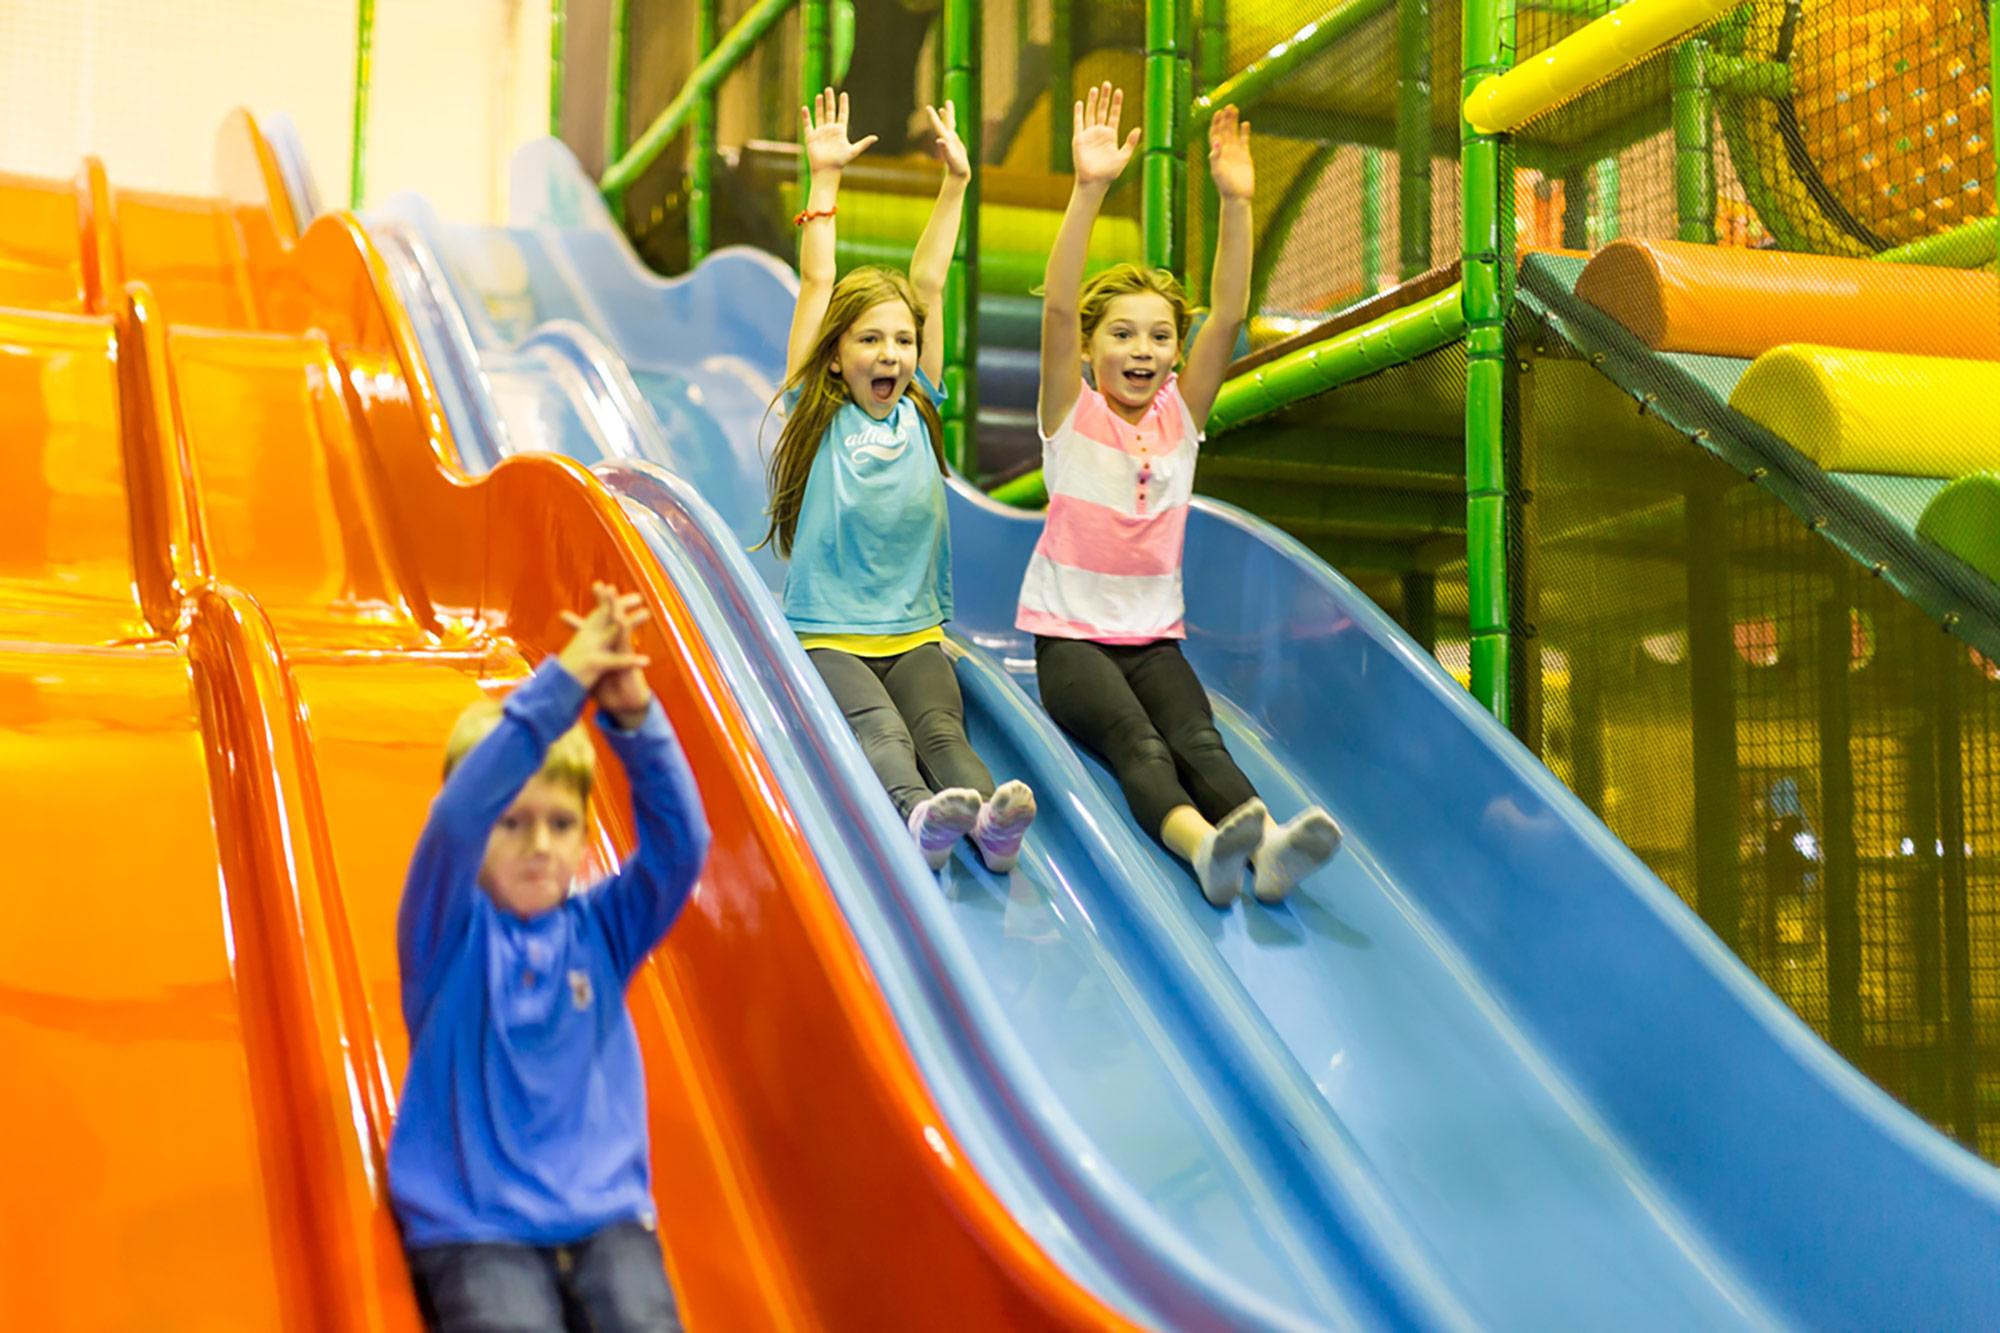 interior-design-indoor-play-facility-kids-slides.jpg